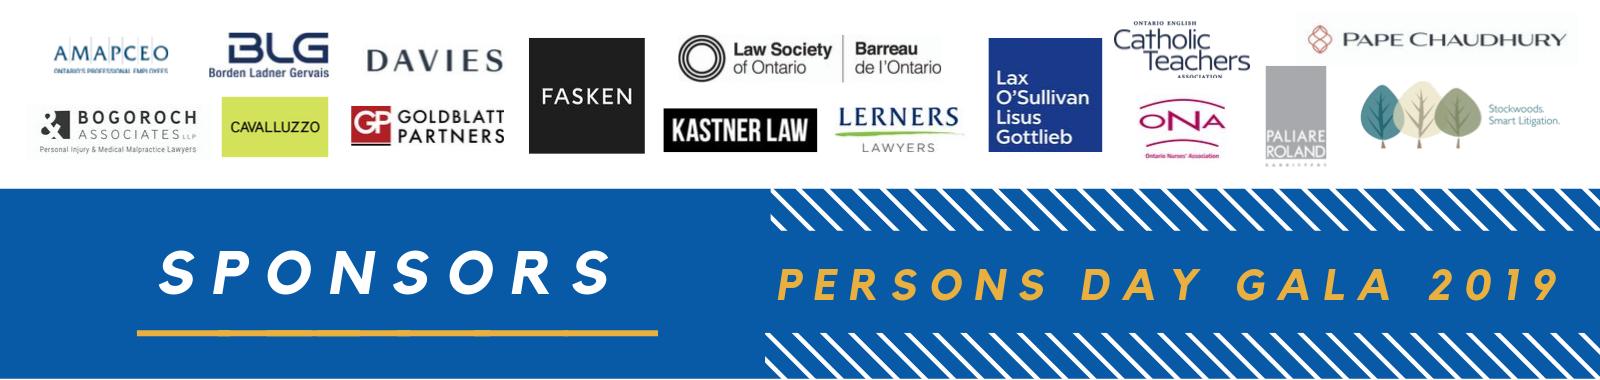 https://www.leaf.ca/wp-content/uploads/2019/10/Persons-Day-Gala-Website-Banner-Slider-LOWER-LEVEL.png